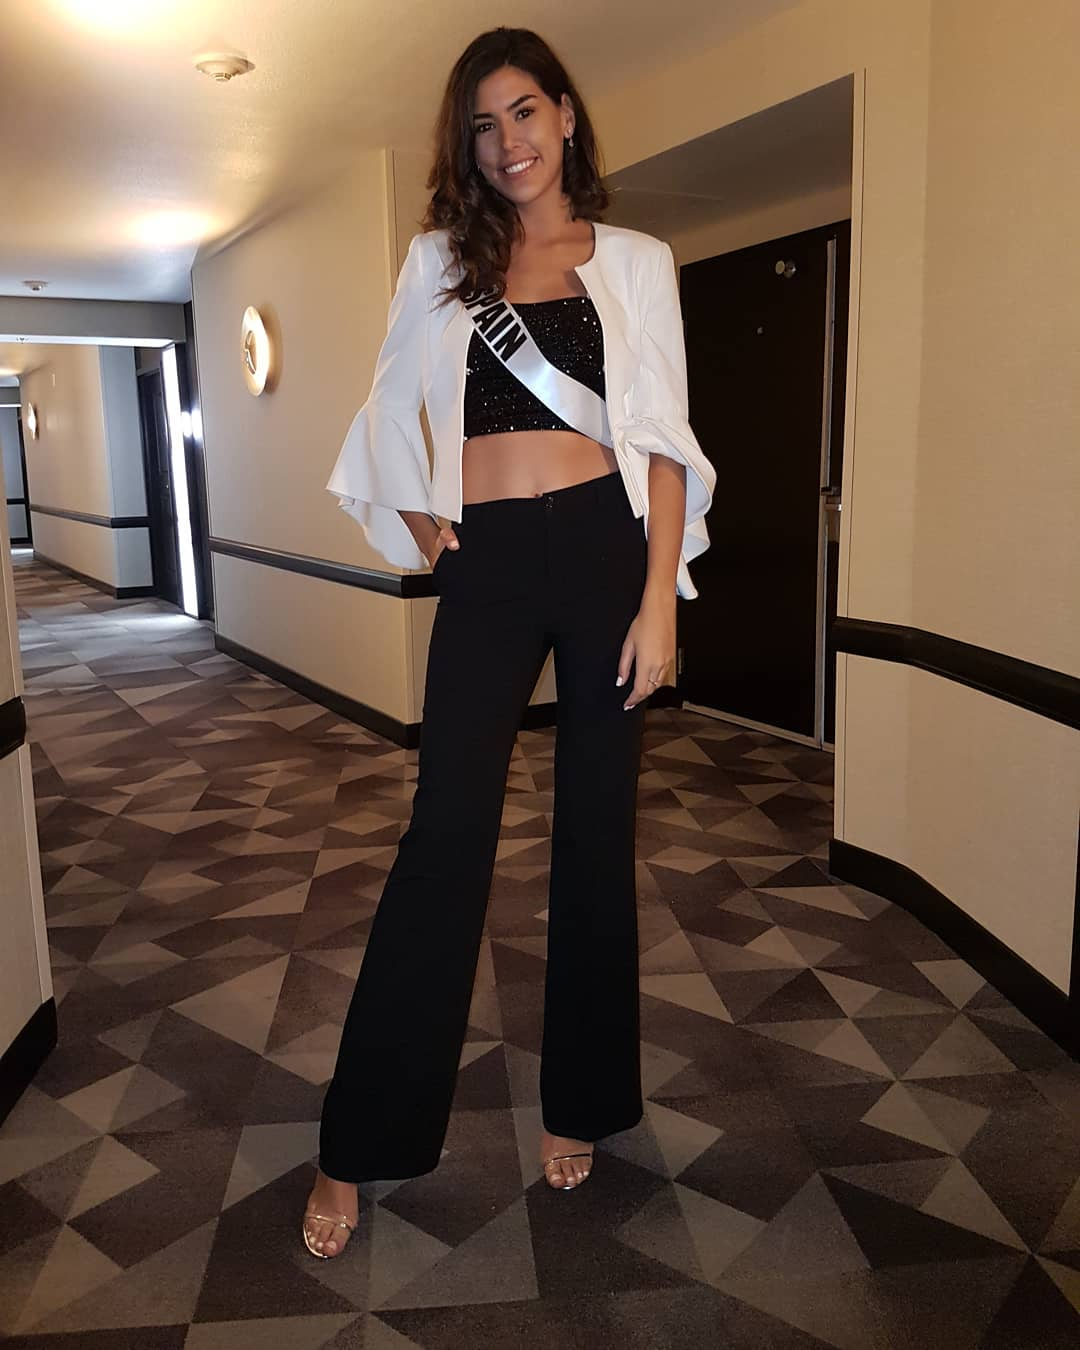 sofia del prado, top 10 de miss universe 2017/reyna hispanoamericana 2015/miss charm spain 2021. - Página 6 23594615